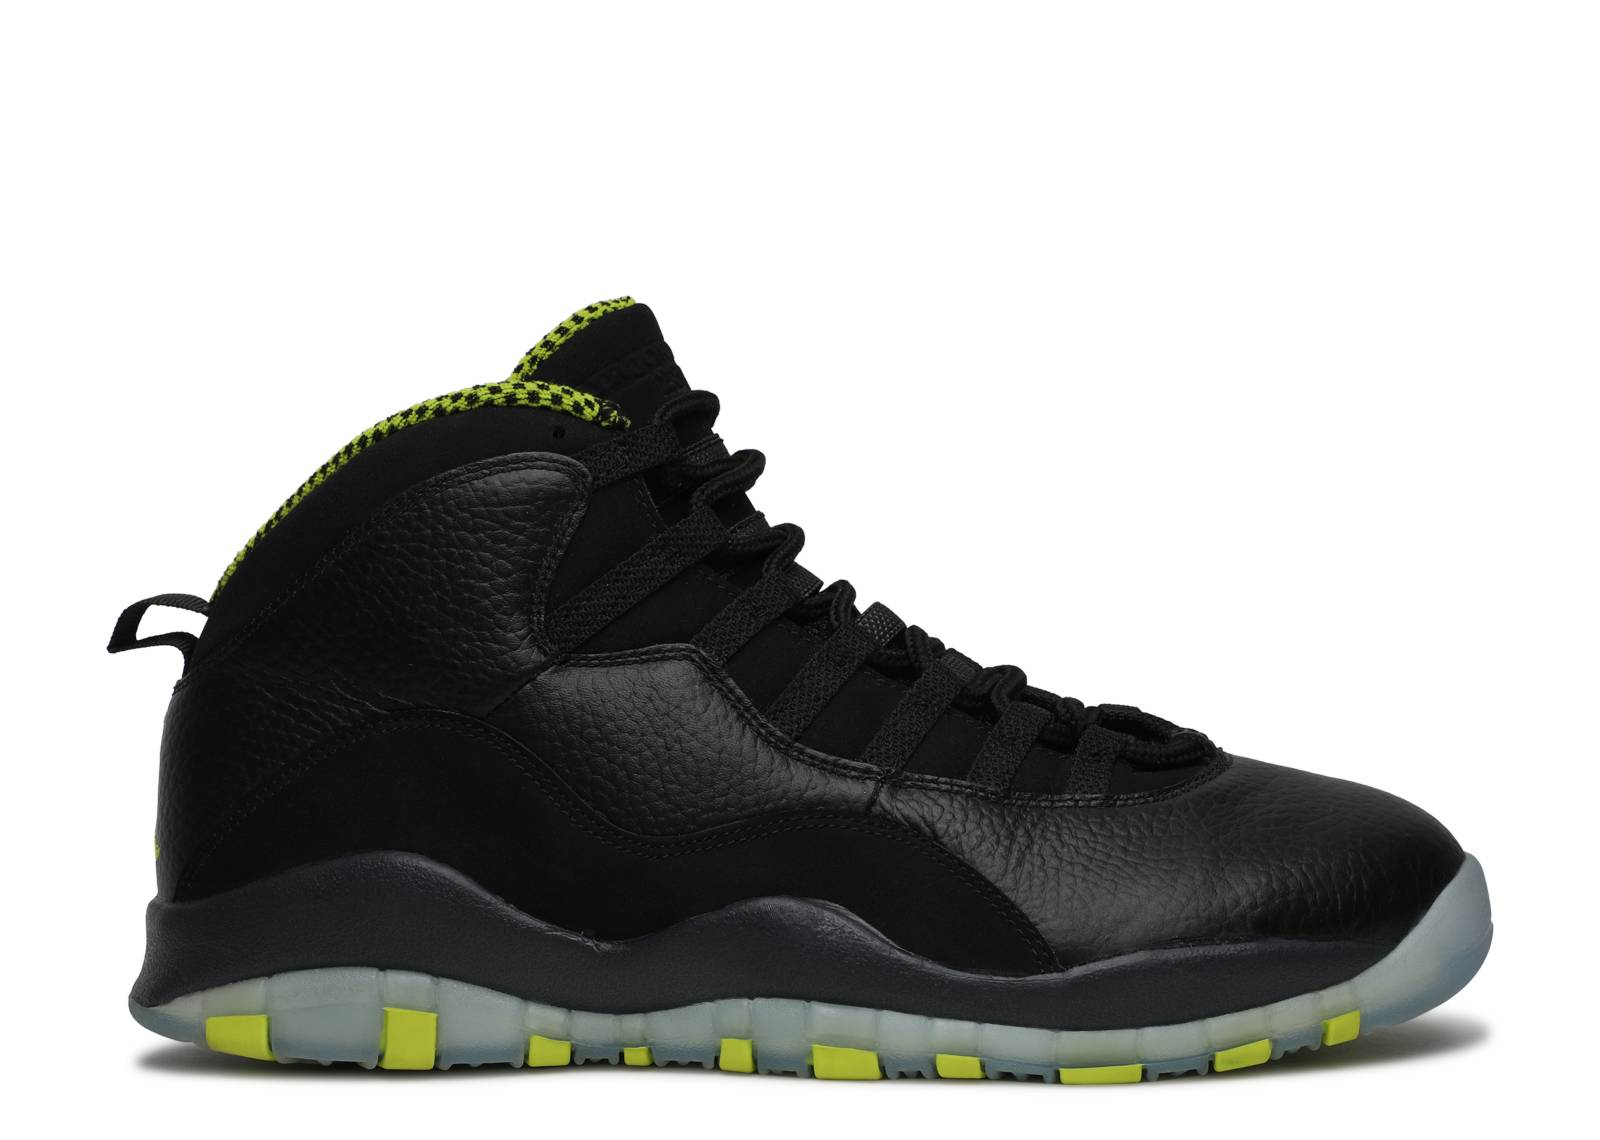 3b7ad004ff53d8 Air Jordan Retro 10